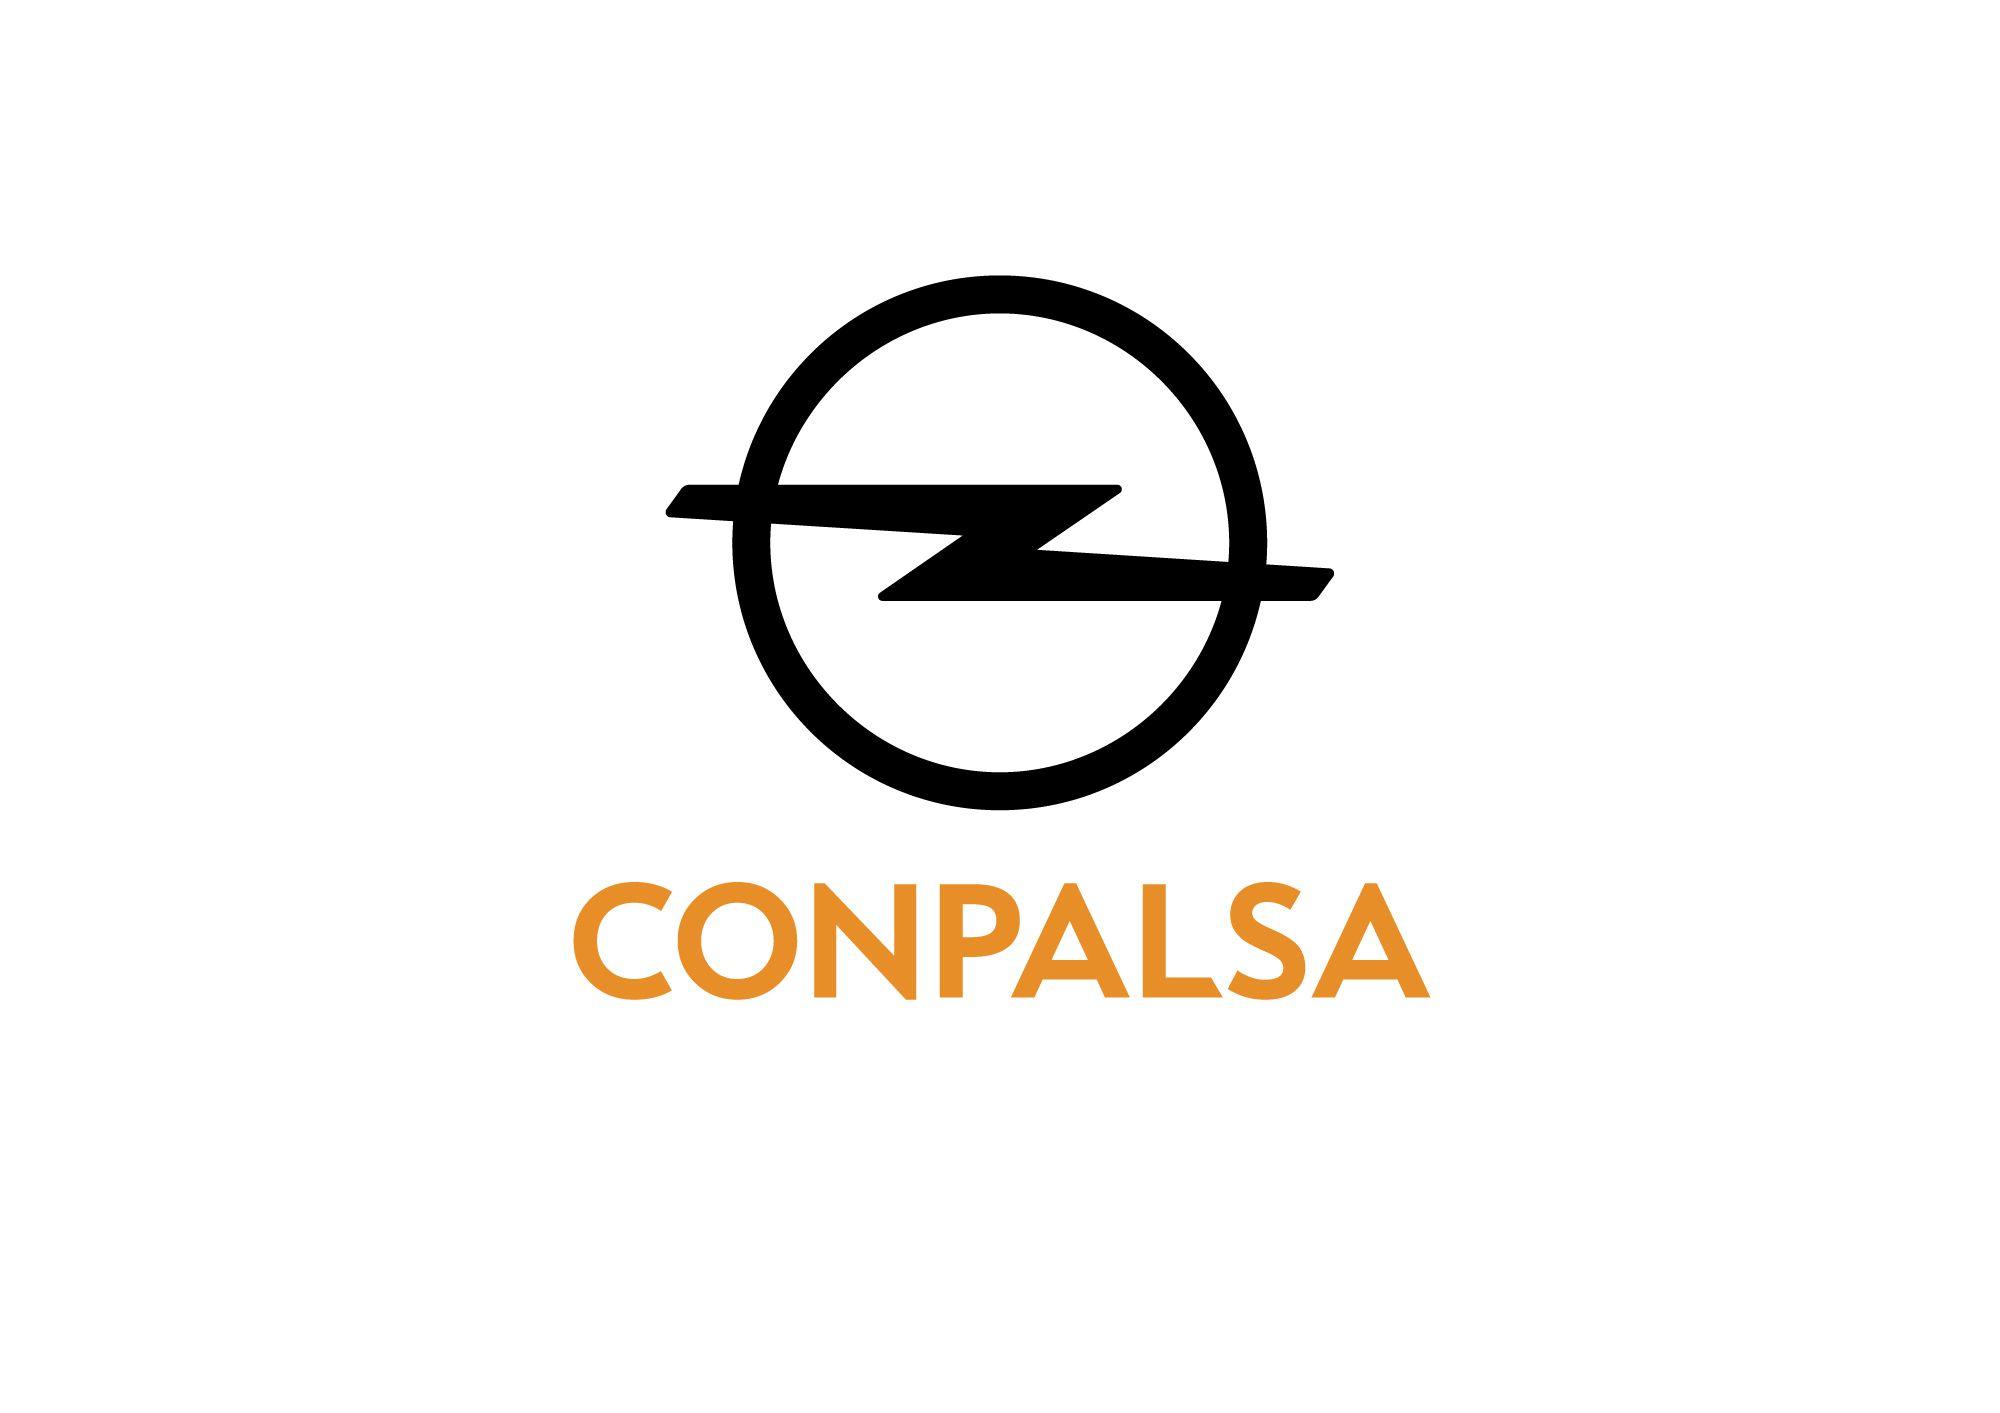 Conpalsa, Concesionario Oficial Opel en Palencia